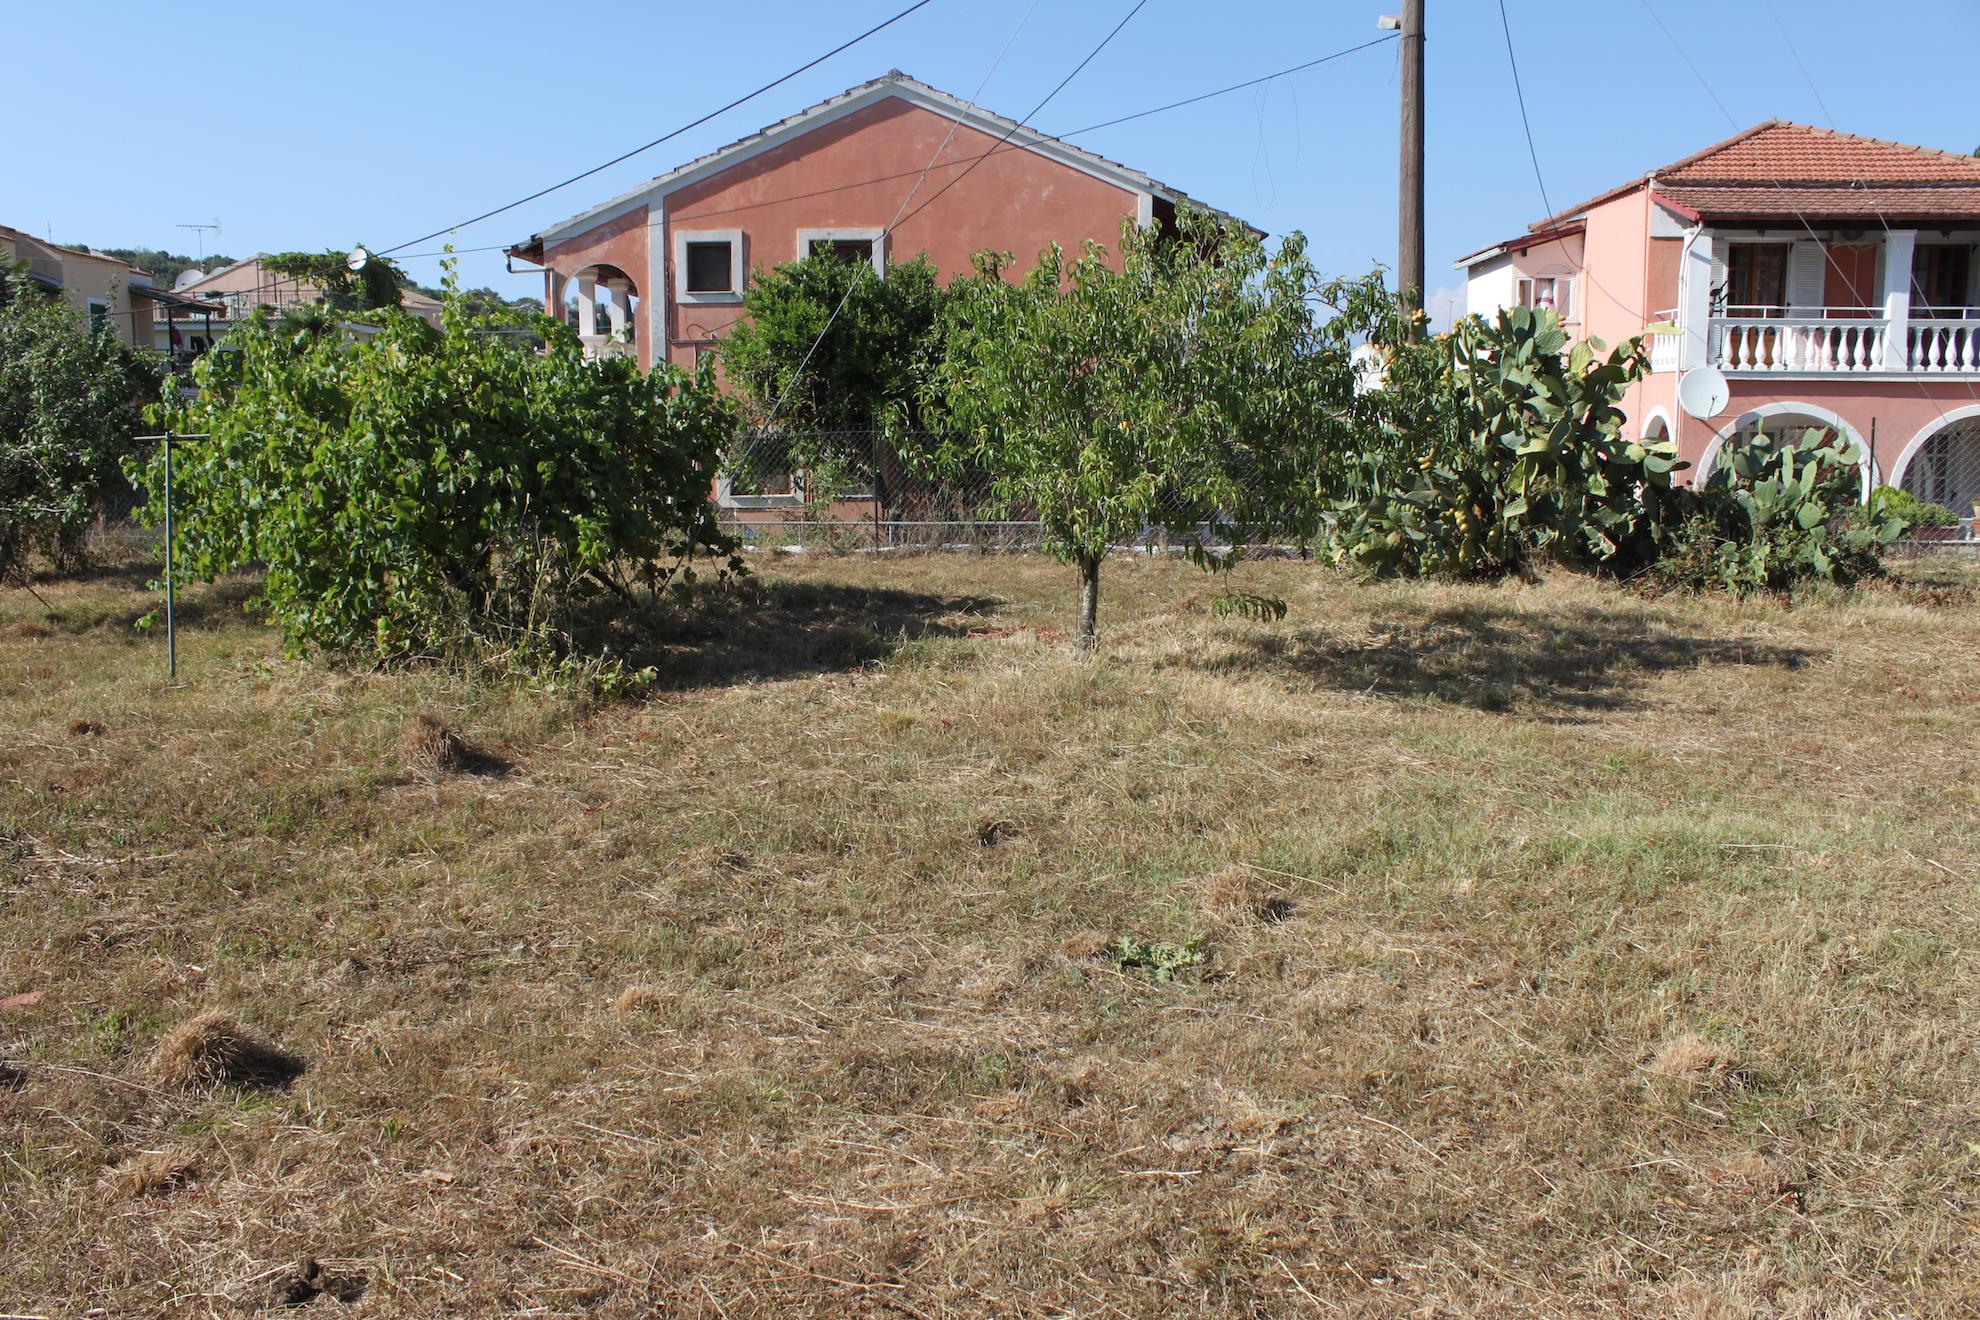 Rouvas land, July 2016 (7).JPG